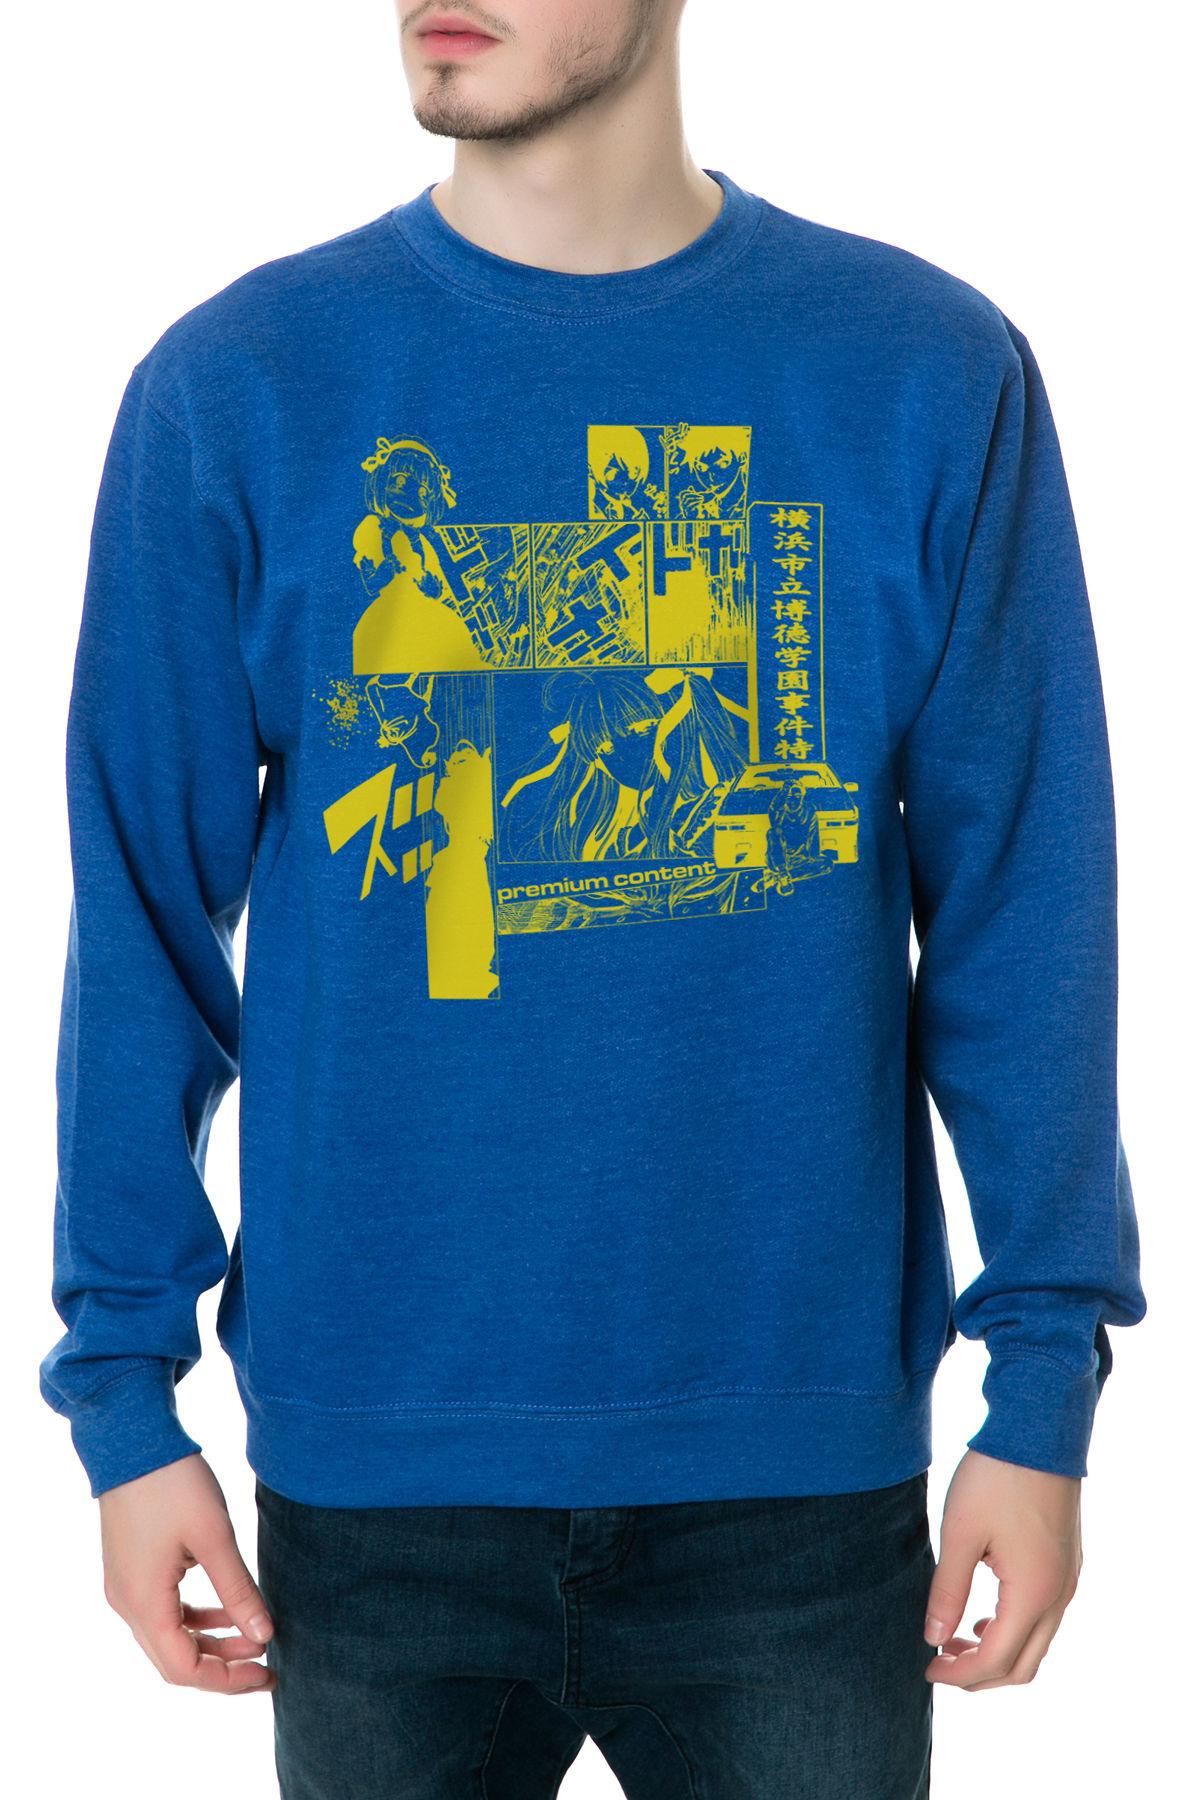 The Manga Crewneck Sweatshirt in Royal Blue